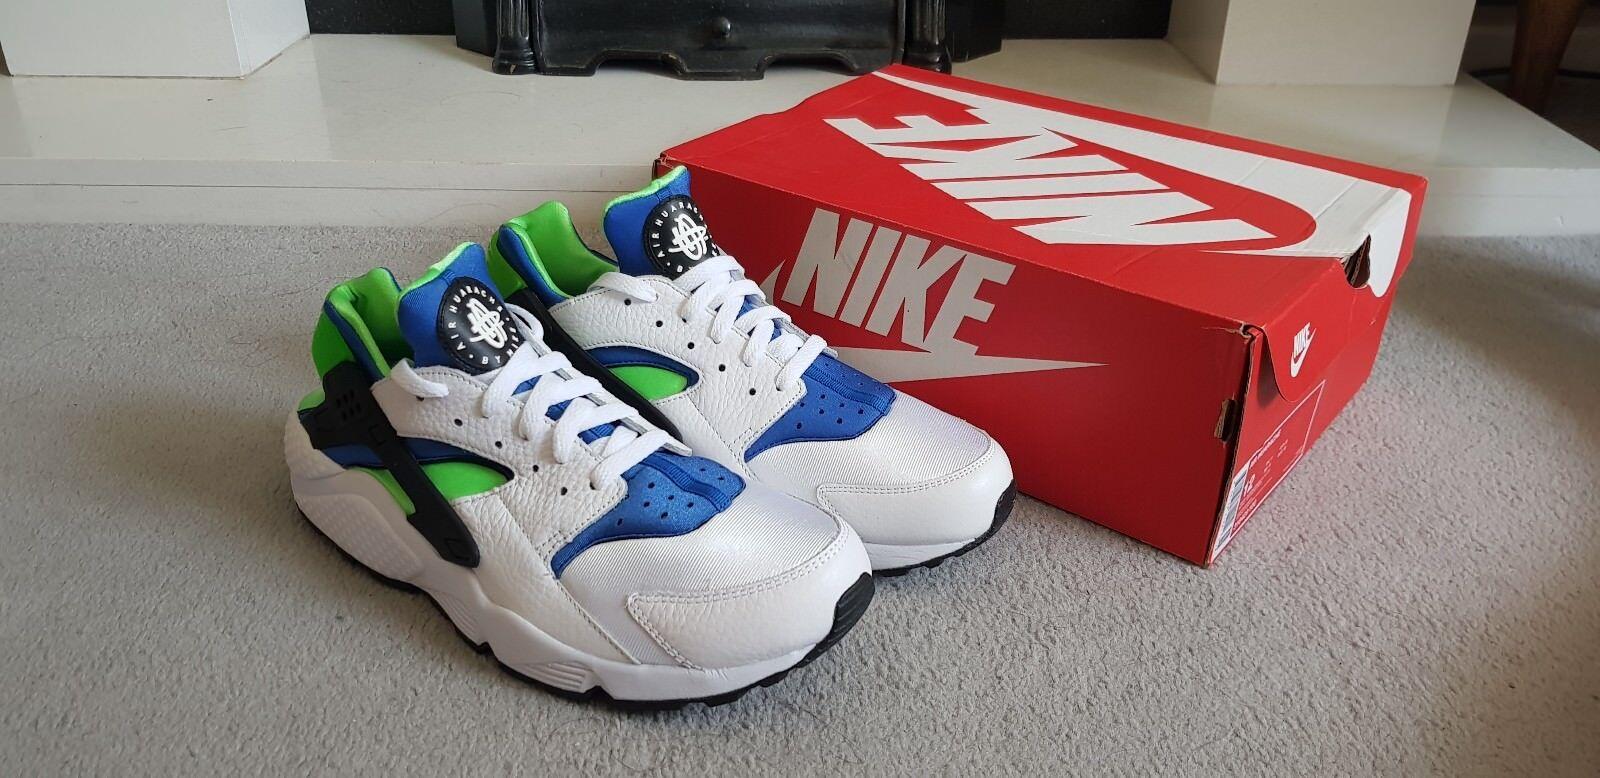 * ÉDITION LIMITÉE * Nike Huarache Homme Taille UK 11 Blanc/Scream Vert/Bleu Royal/BLK